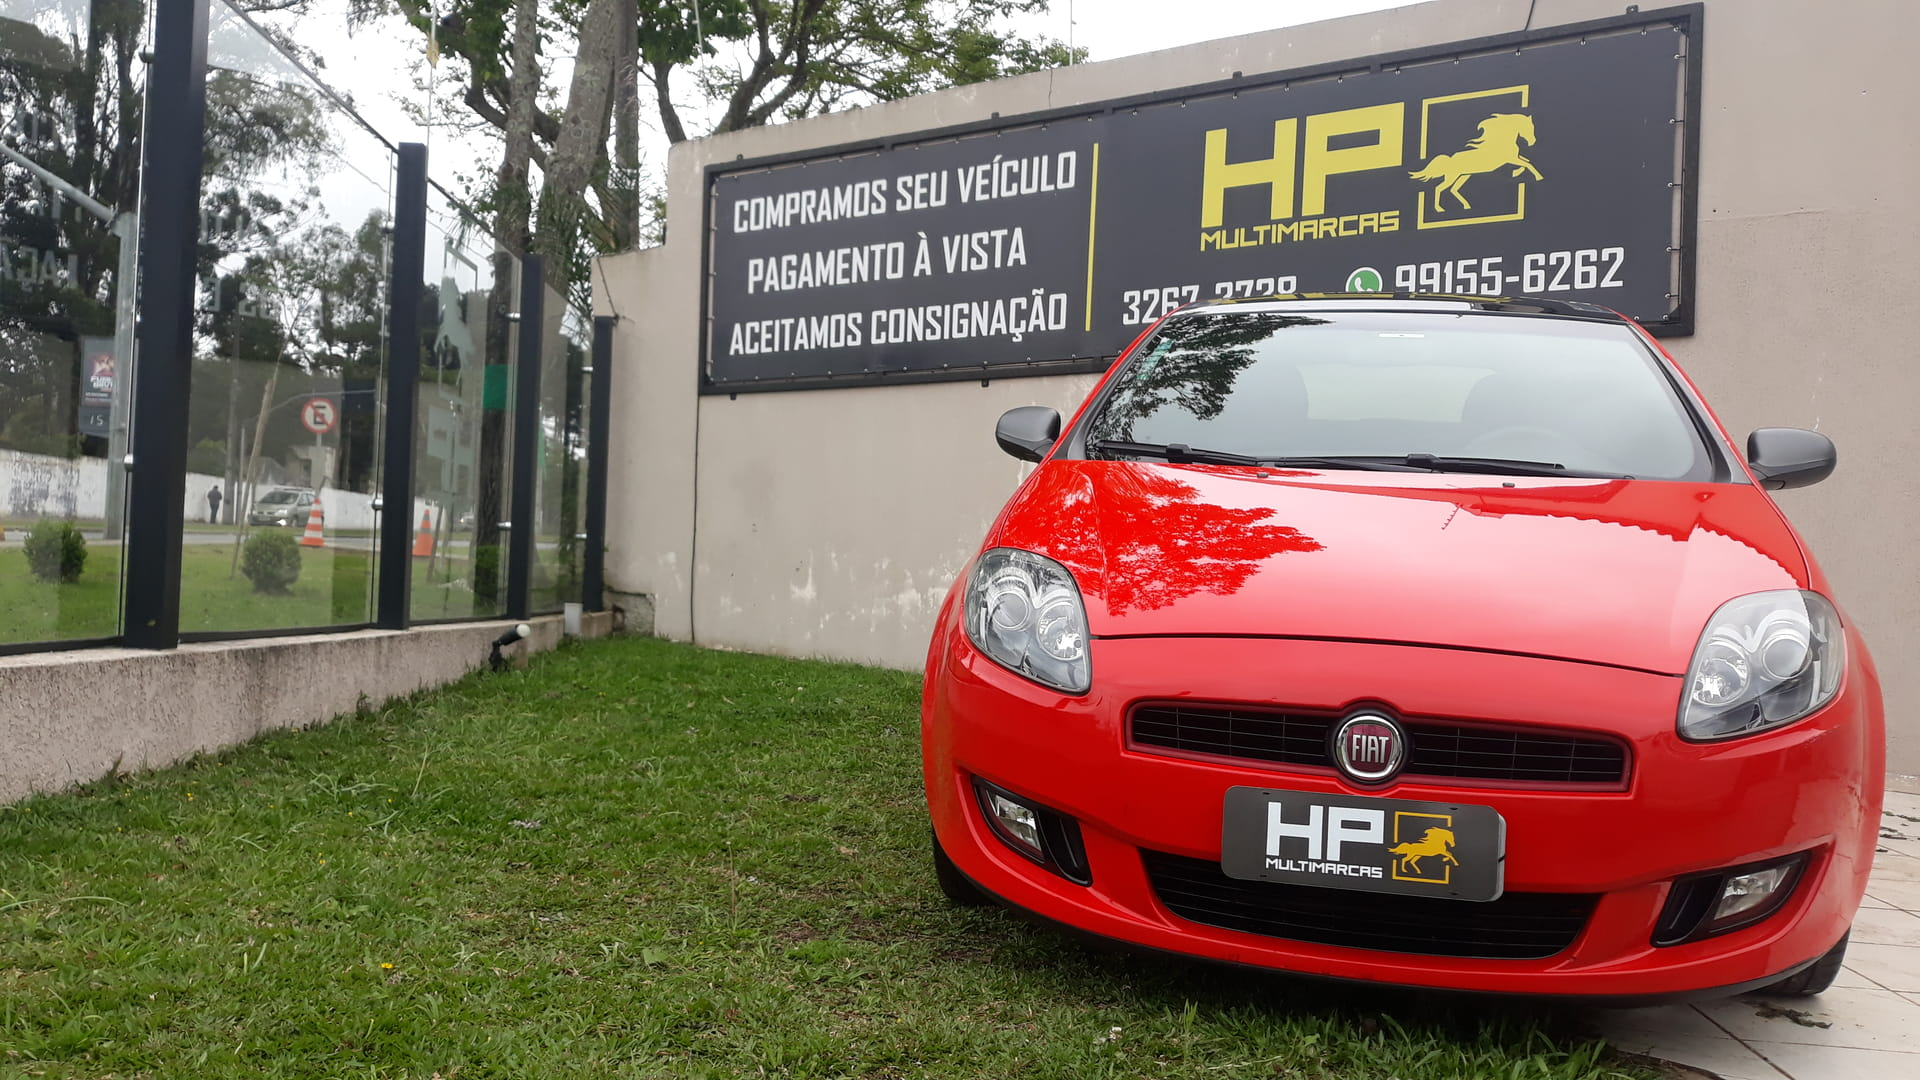 FIAT BRAVO SPORTING 1.8 FLEX 16V 5P